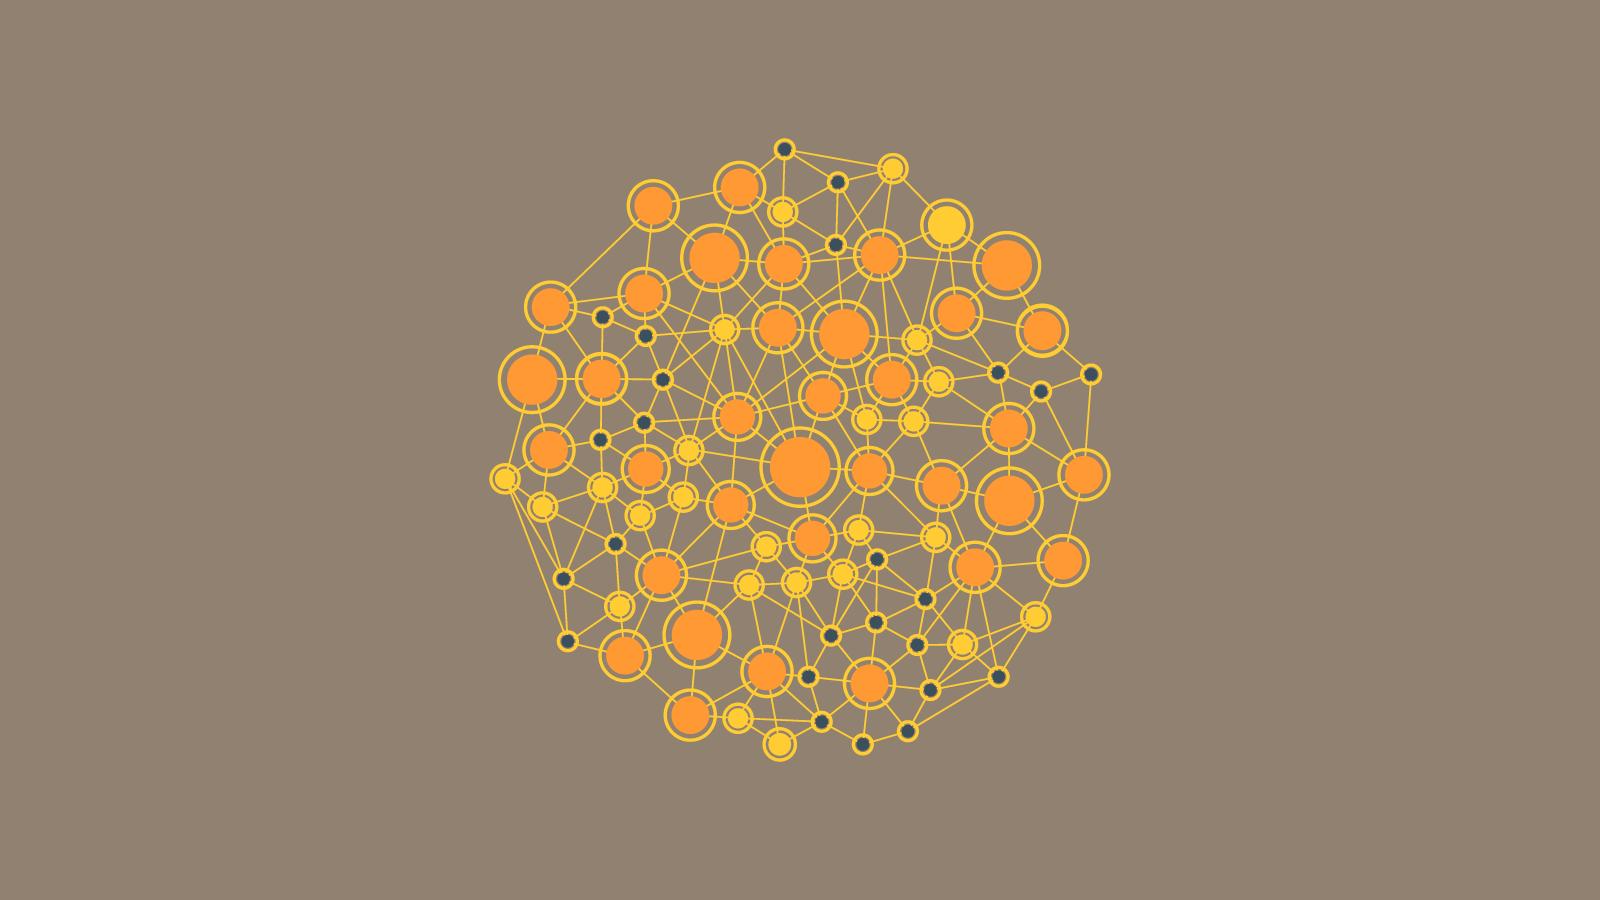 node link diagram